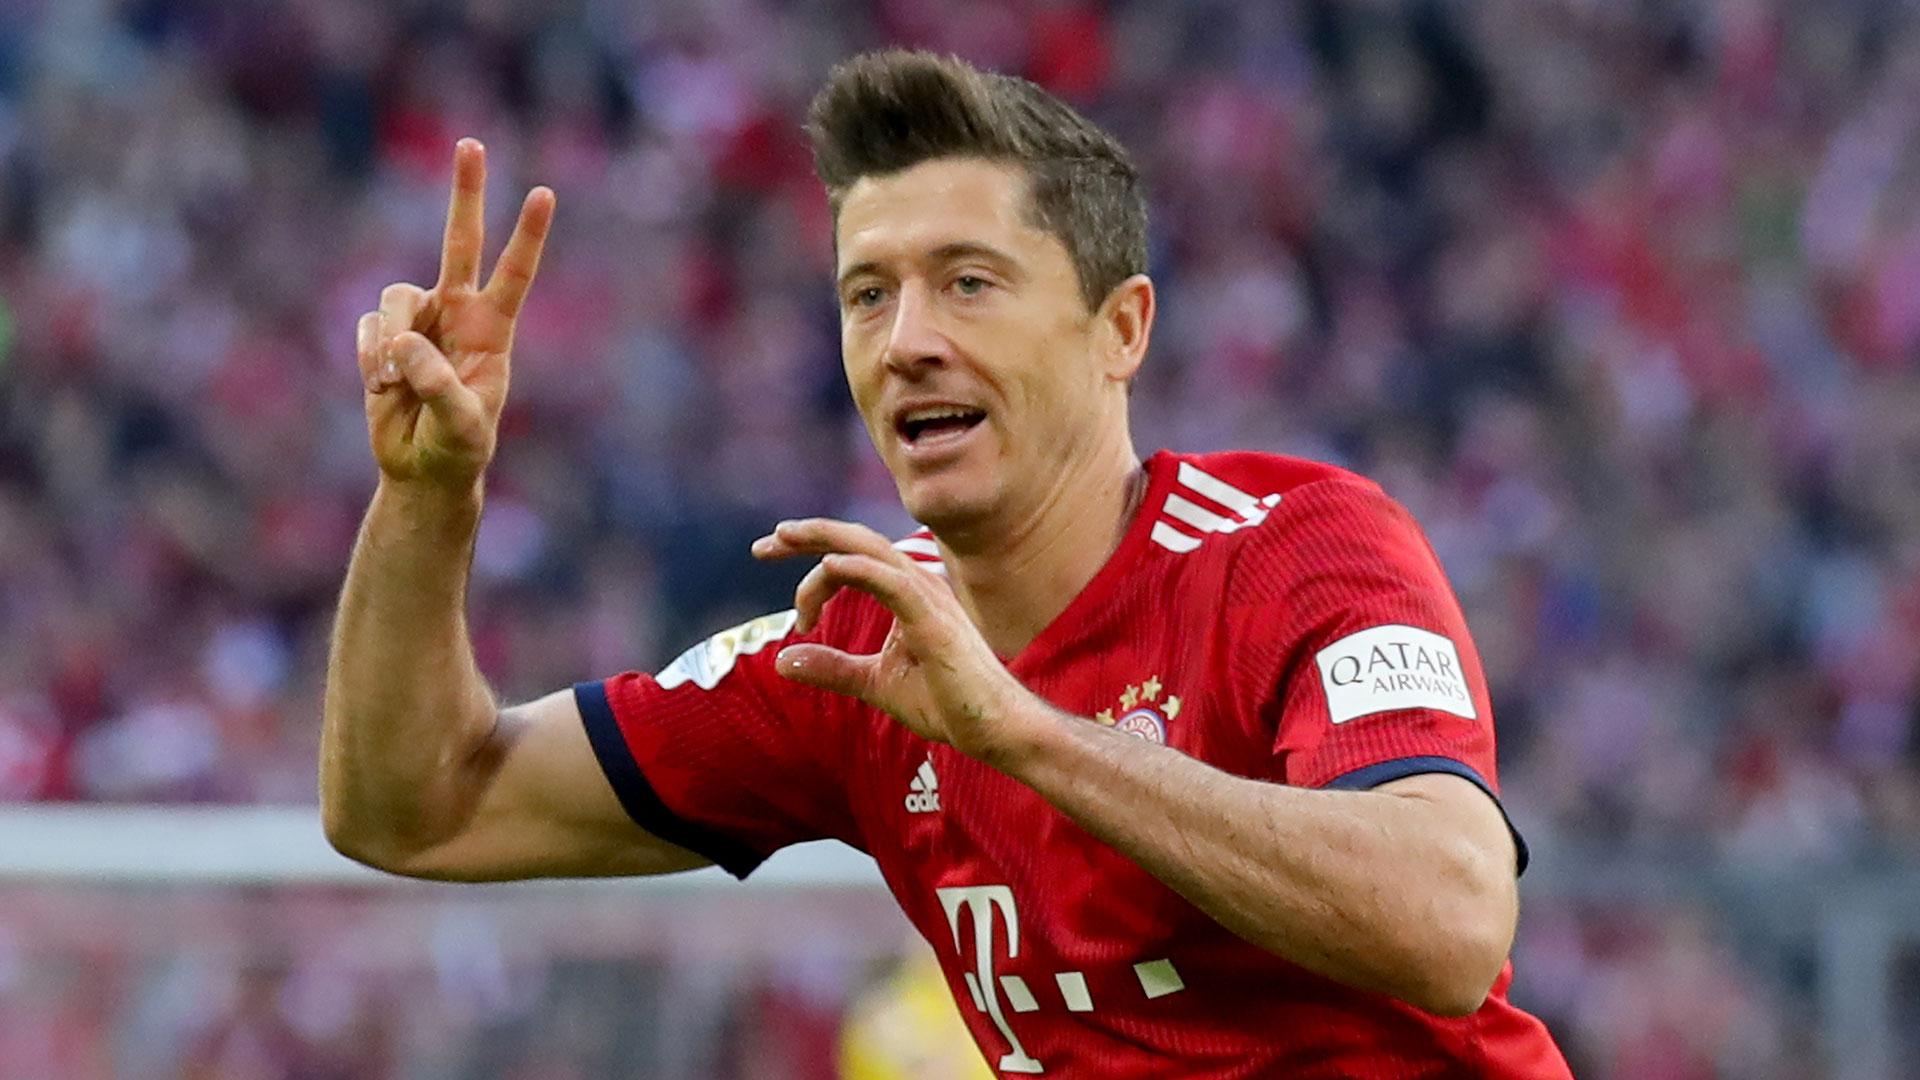 Mercato - Bayern Munich : Robert Lewandowski et Joshua Kimmich demandent de nouvelles recrues